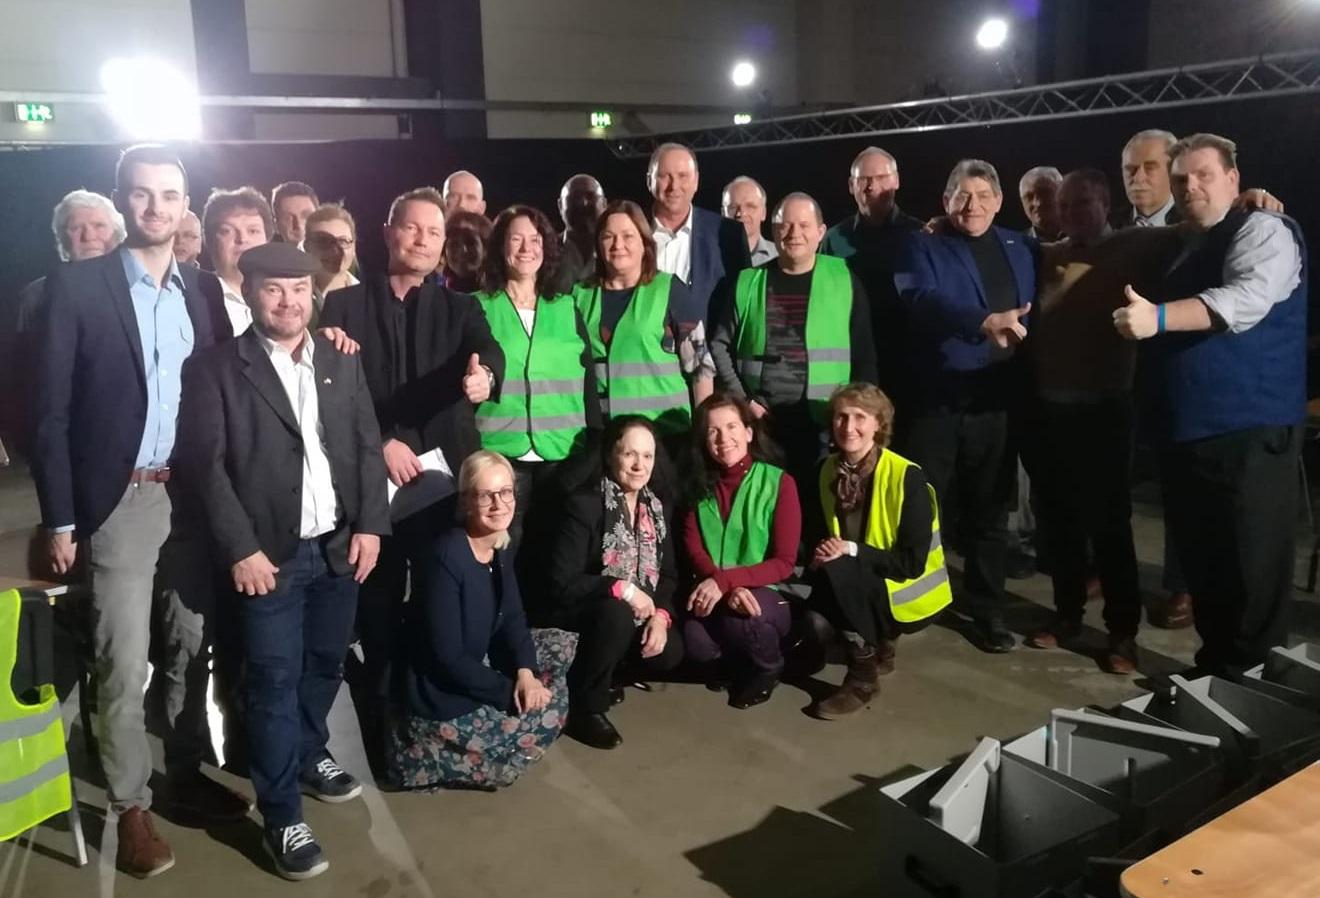 20190114 AfD-Europawahl-Kandidaten Orga-Team